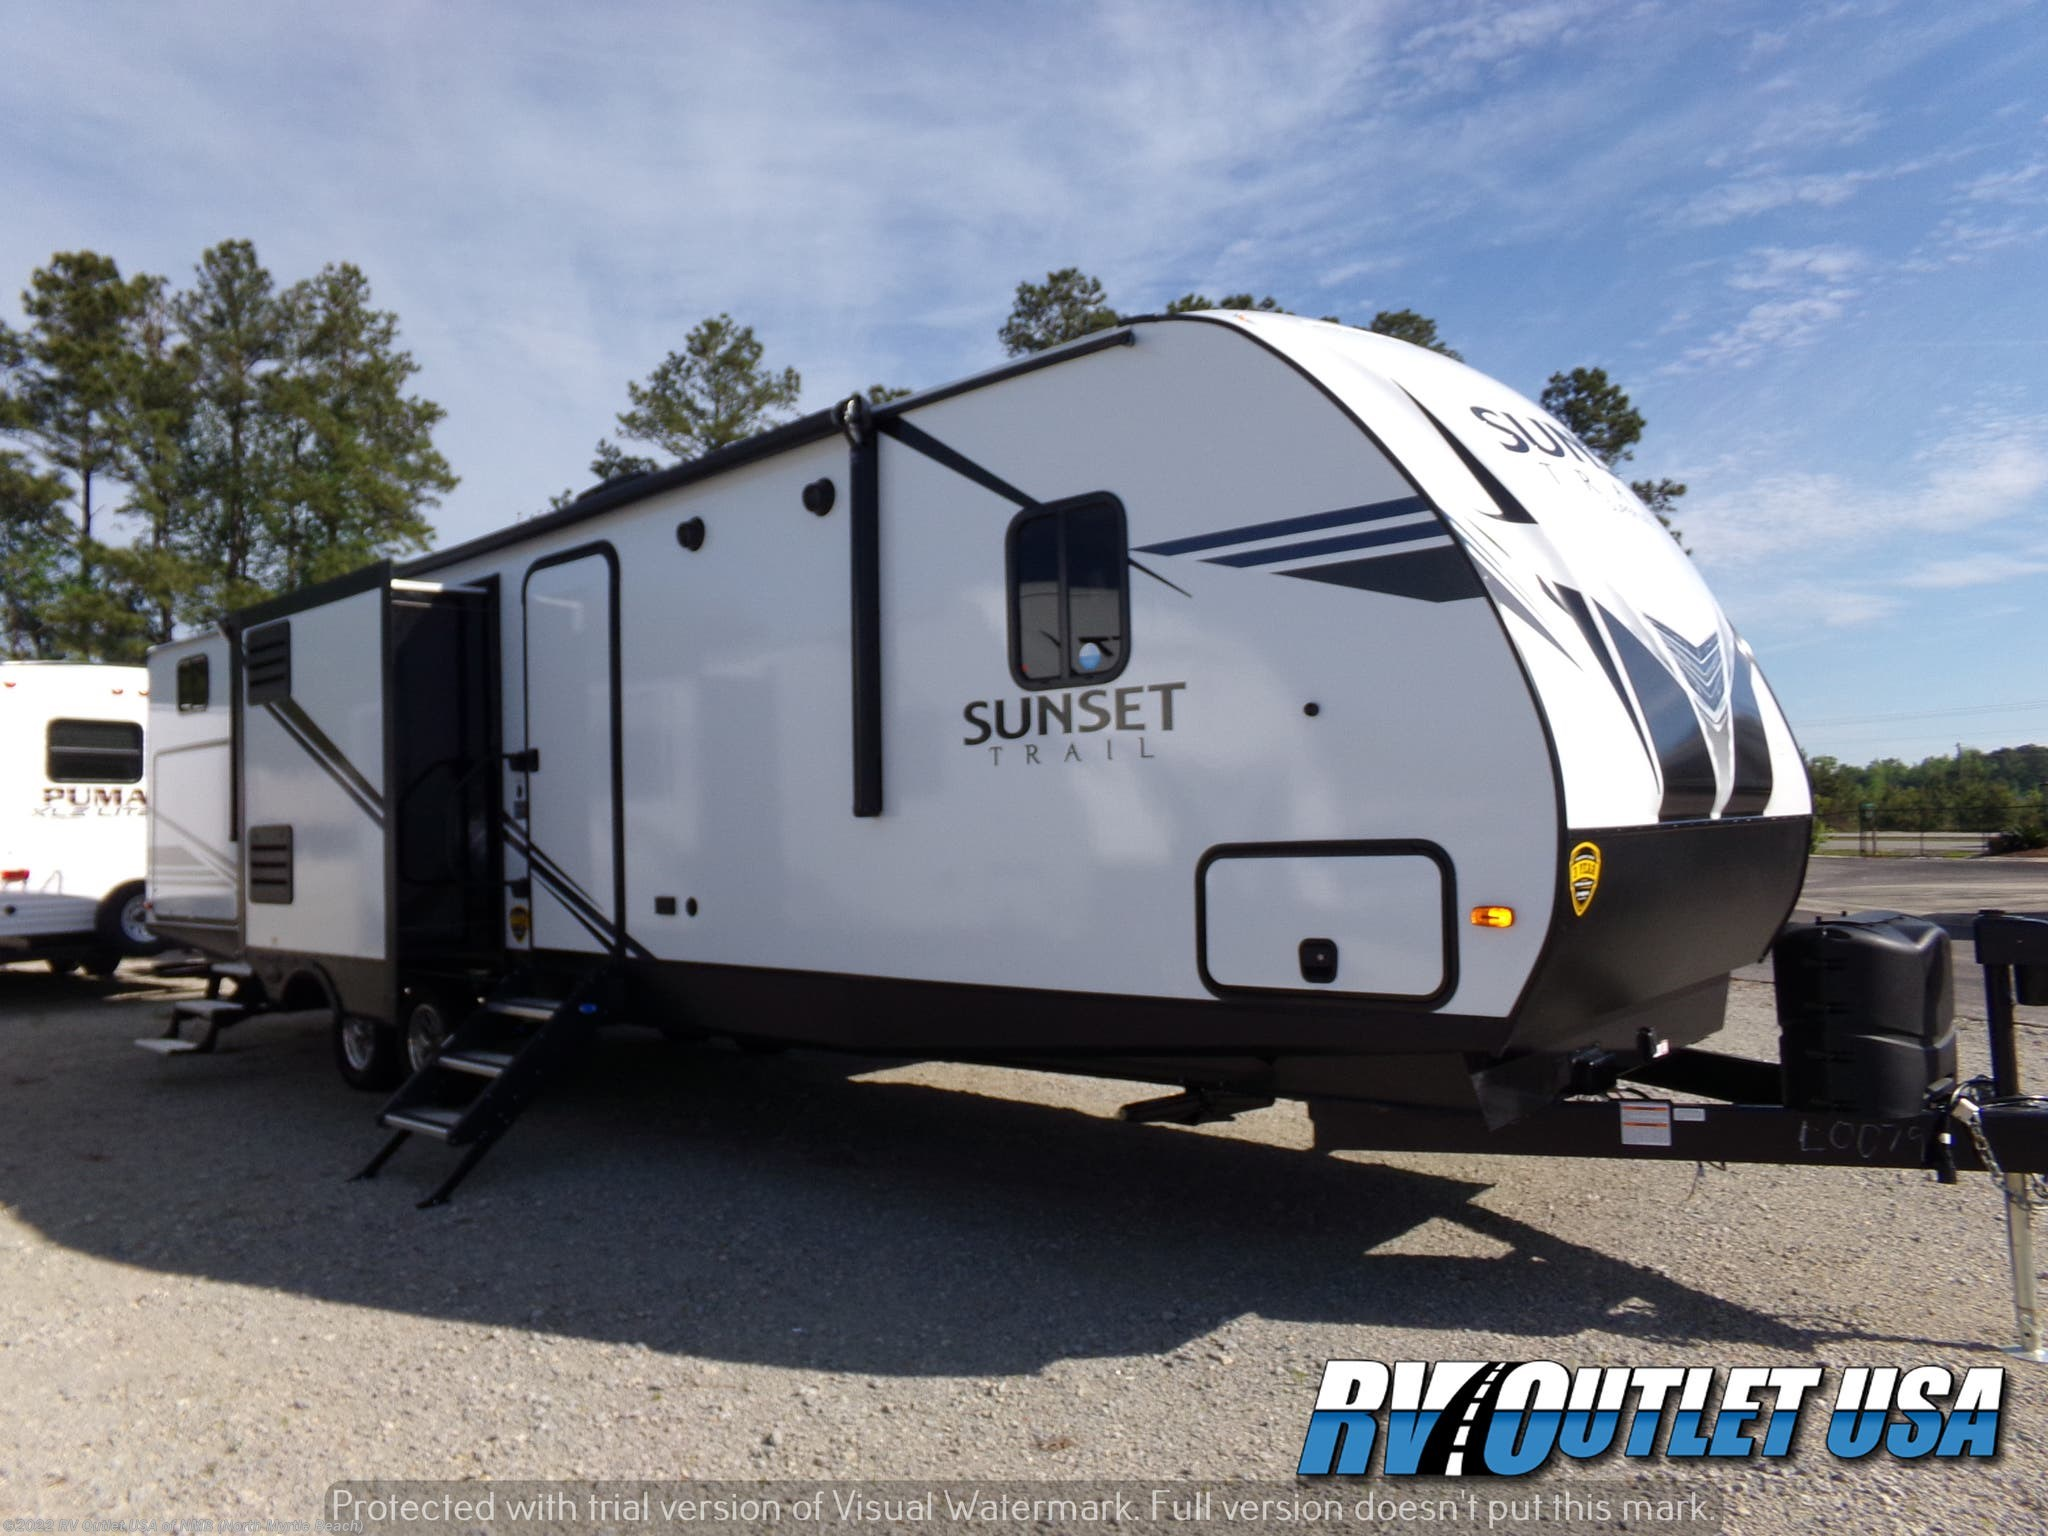 2020 CrossRoads RV Sunset Trail Super Lite 331BH for Sale in Ringgold, VA  24586 | SCCS1151